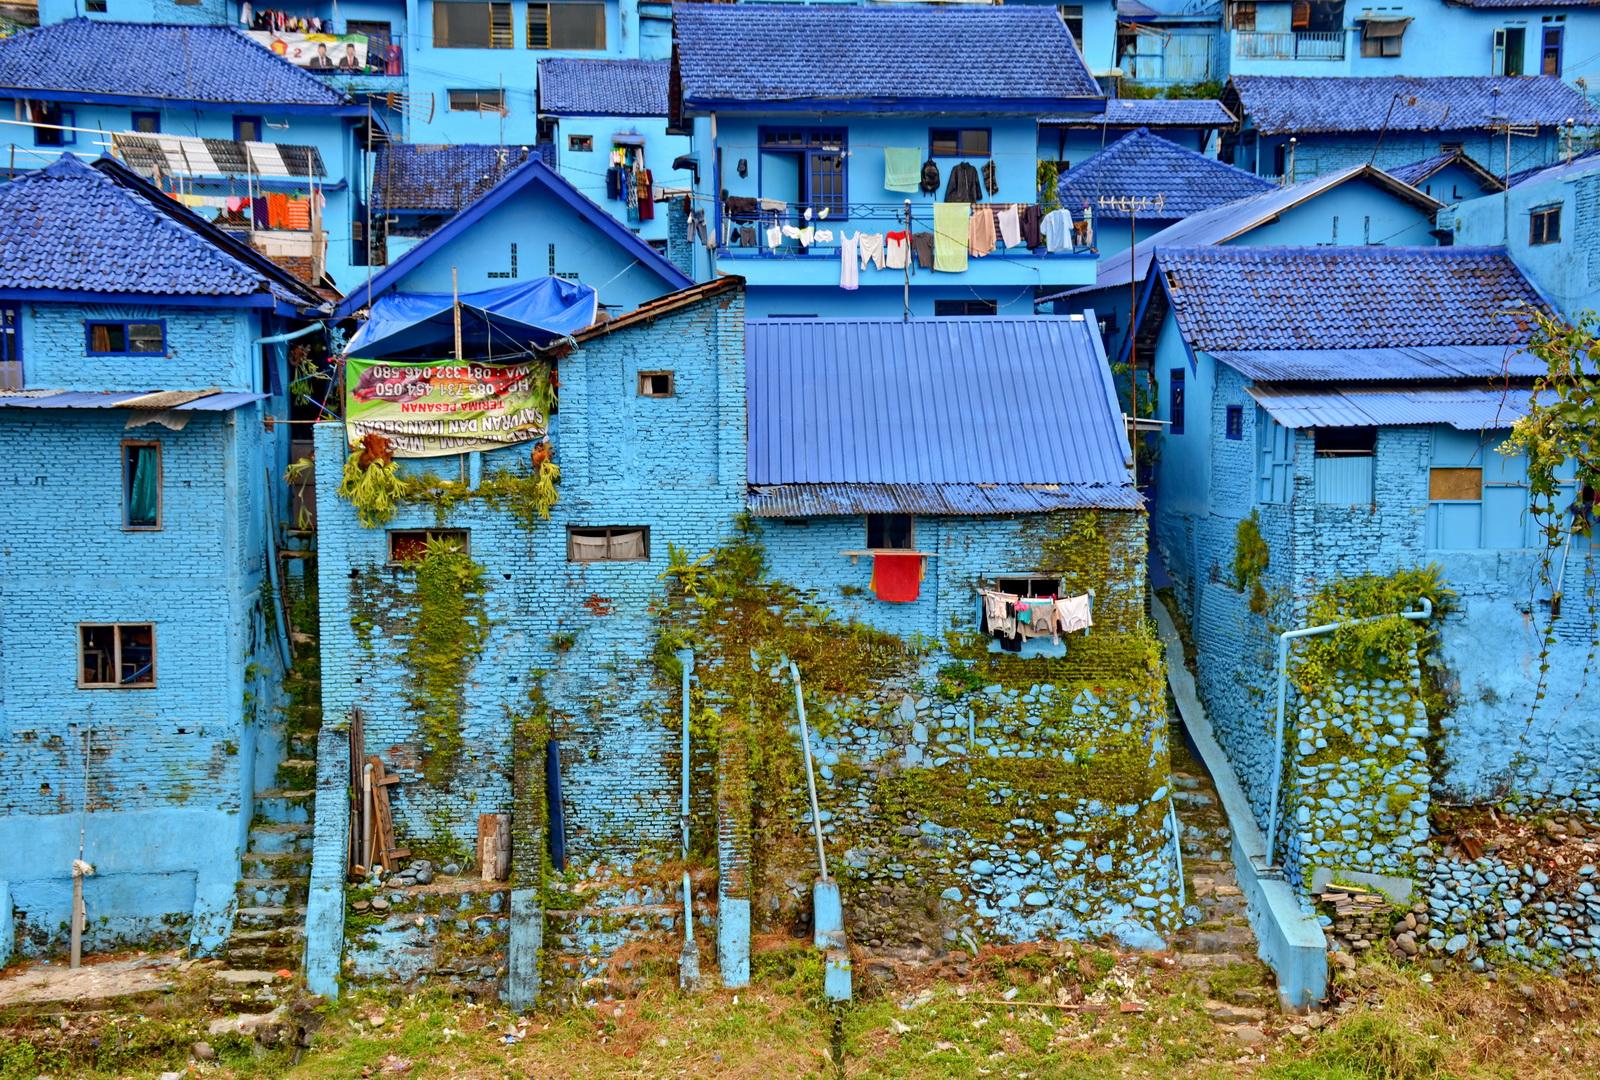 Indonesia, Malang's Kampung Biru Arema - 'come on you blues'